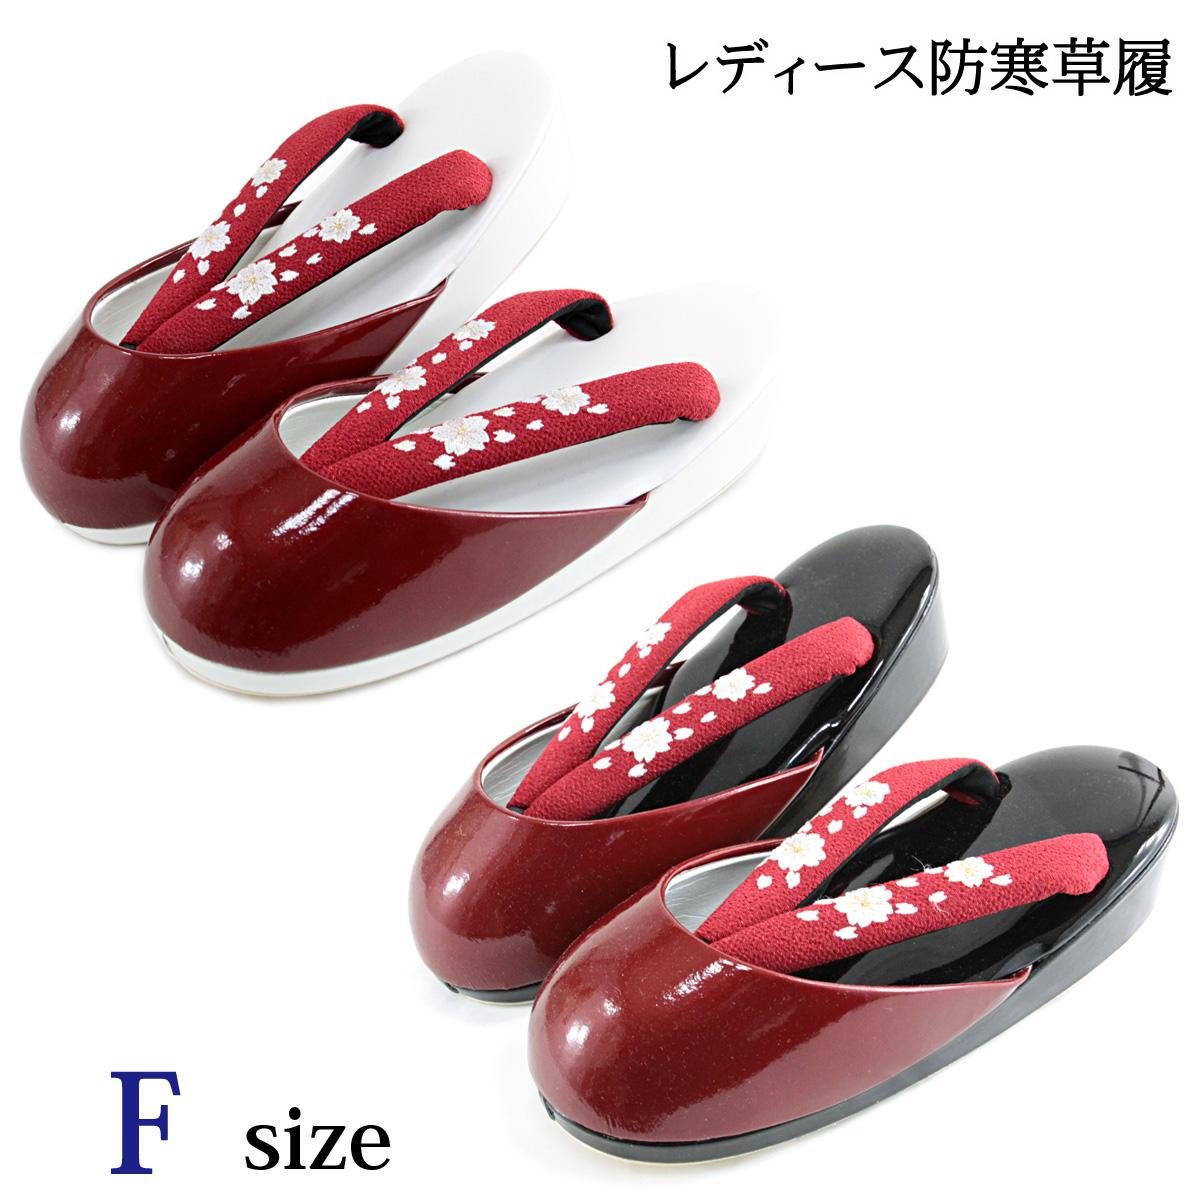 防寒草履 -14- 赤刺繍鼻緒 レディース 合成皮革 Free Size